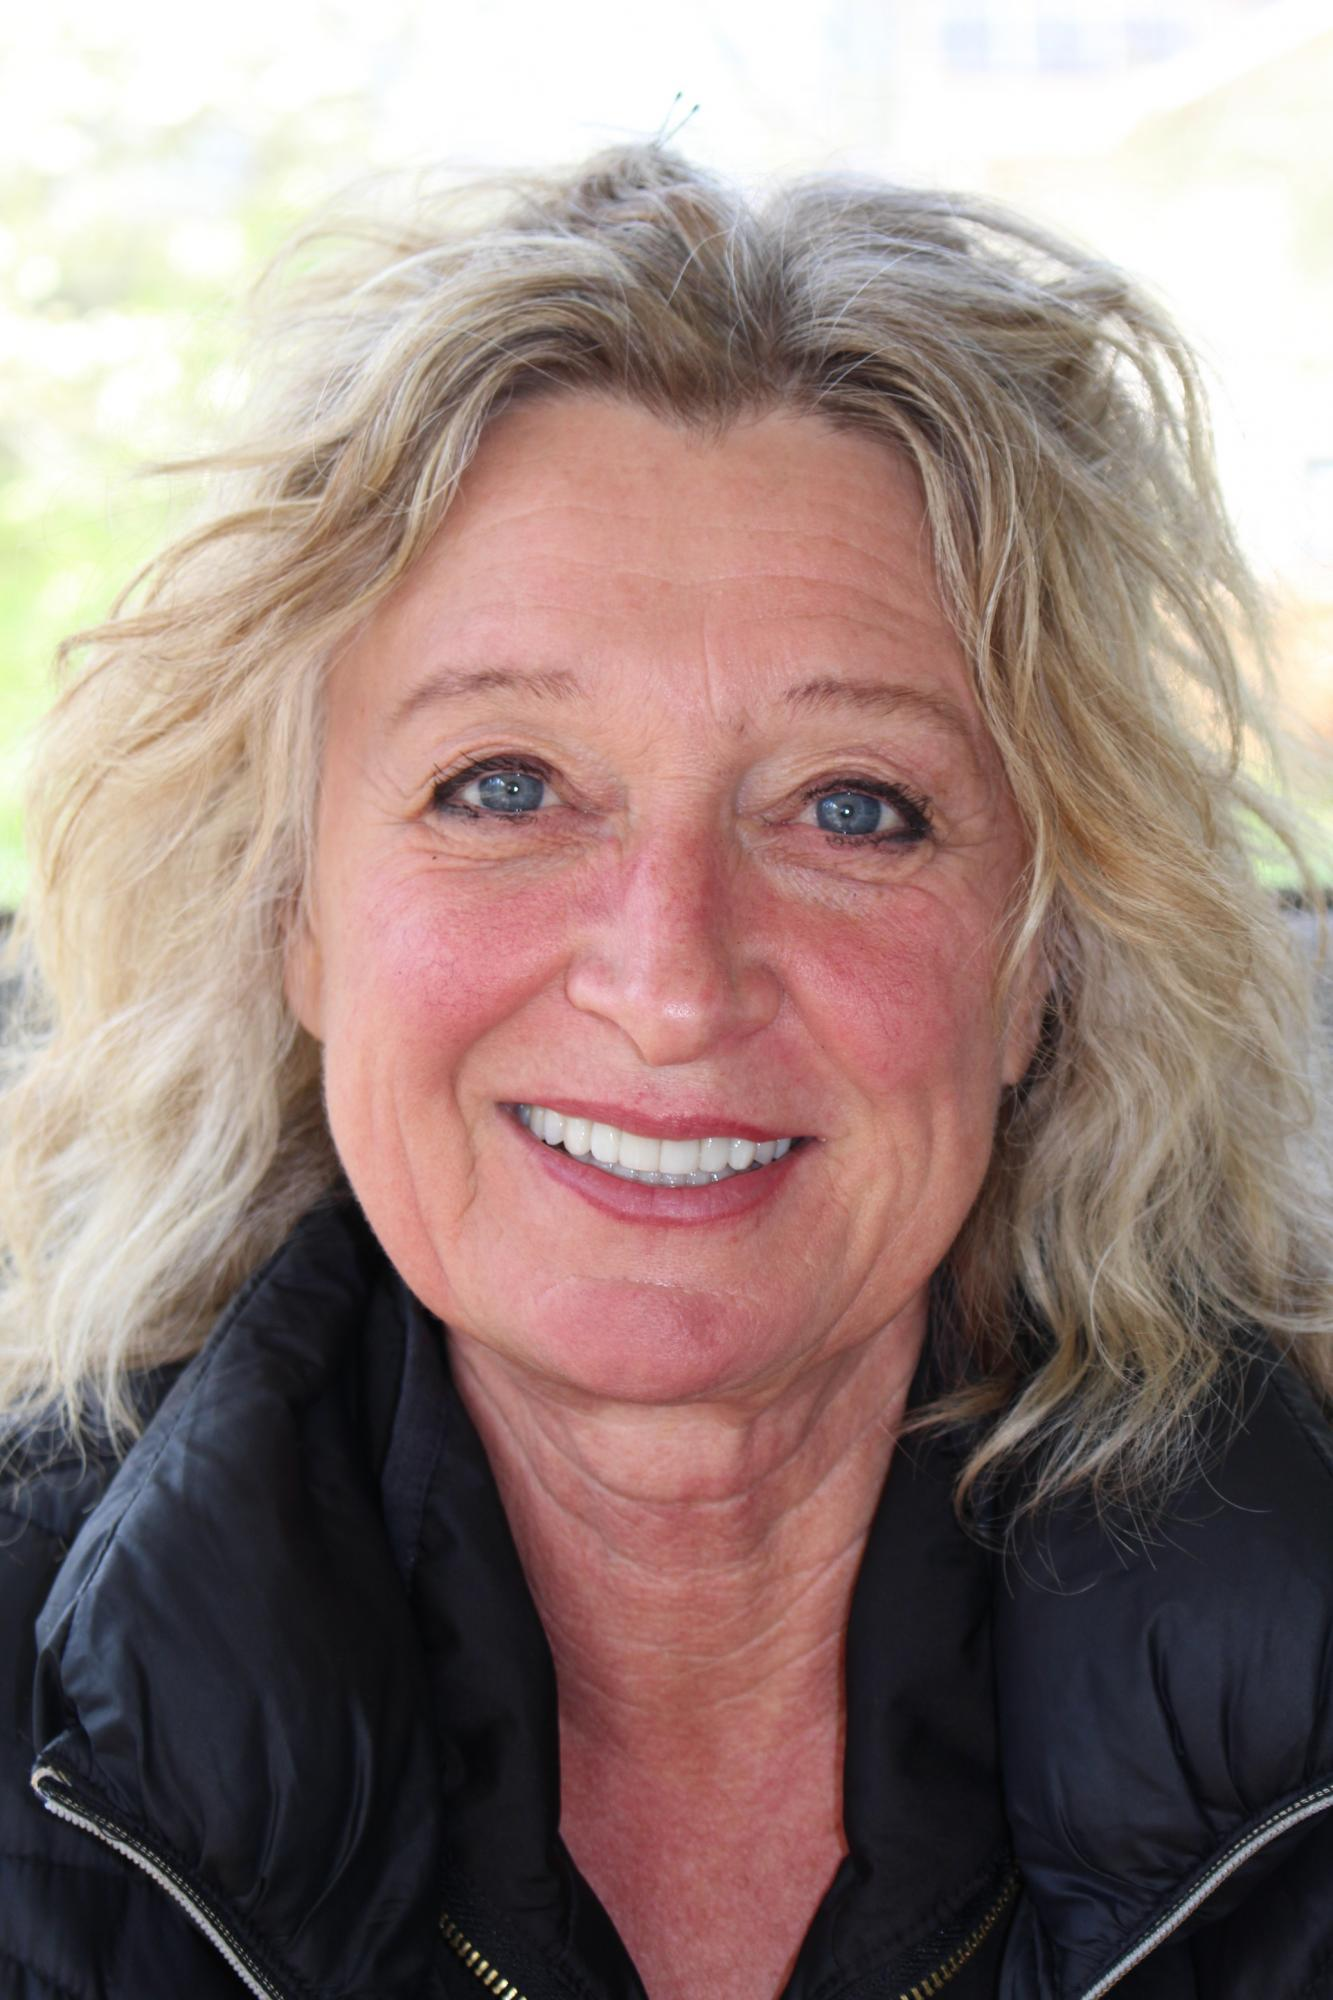 Janice Frey LMT, Massage Therapist for Montague Retreat Center